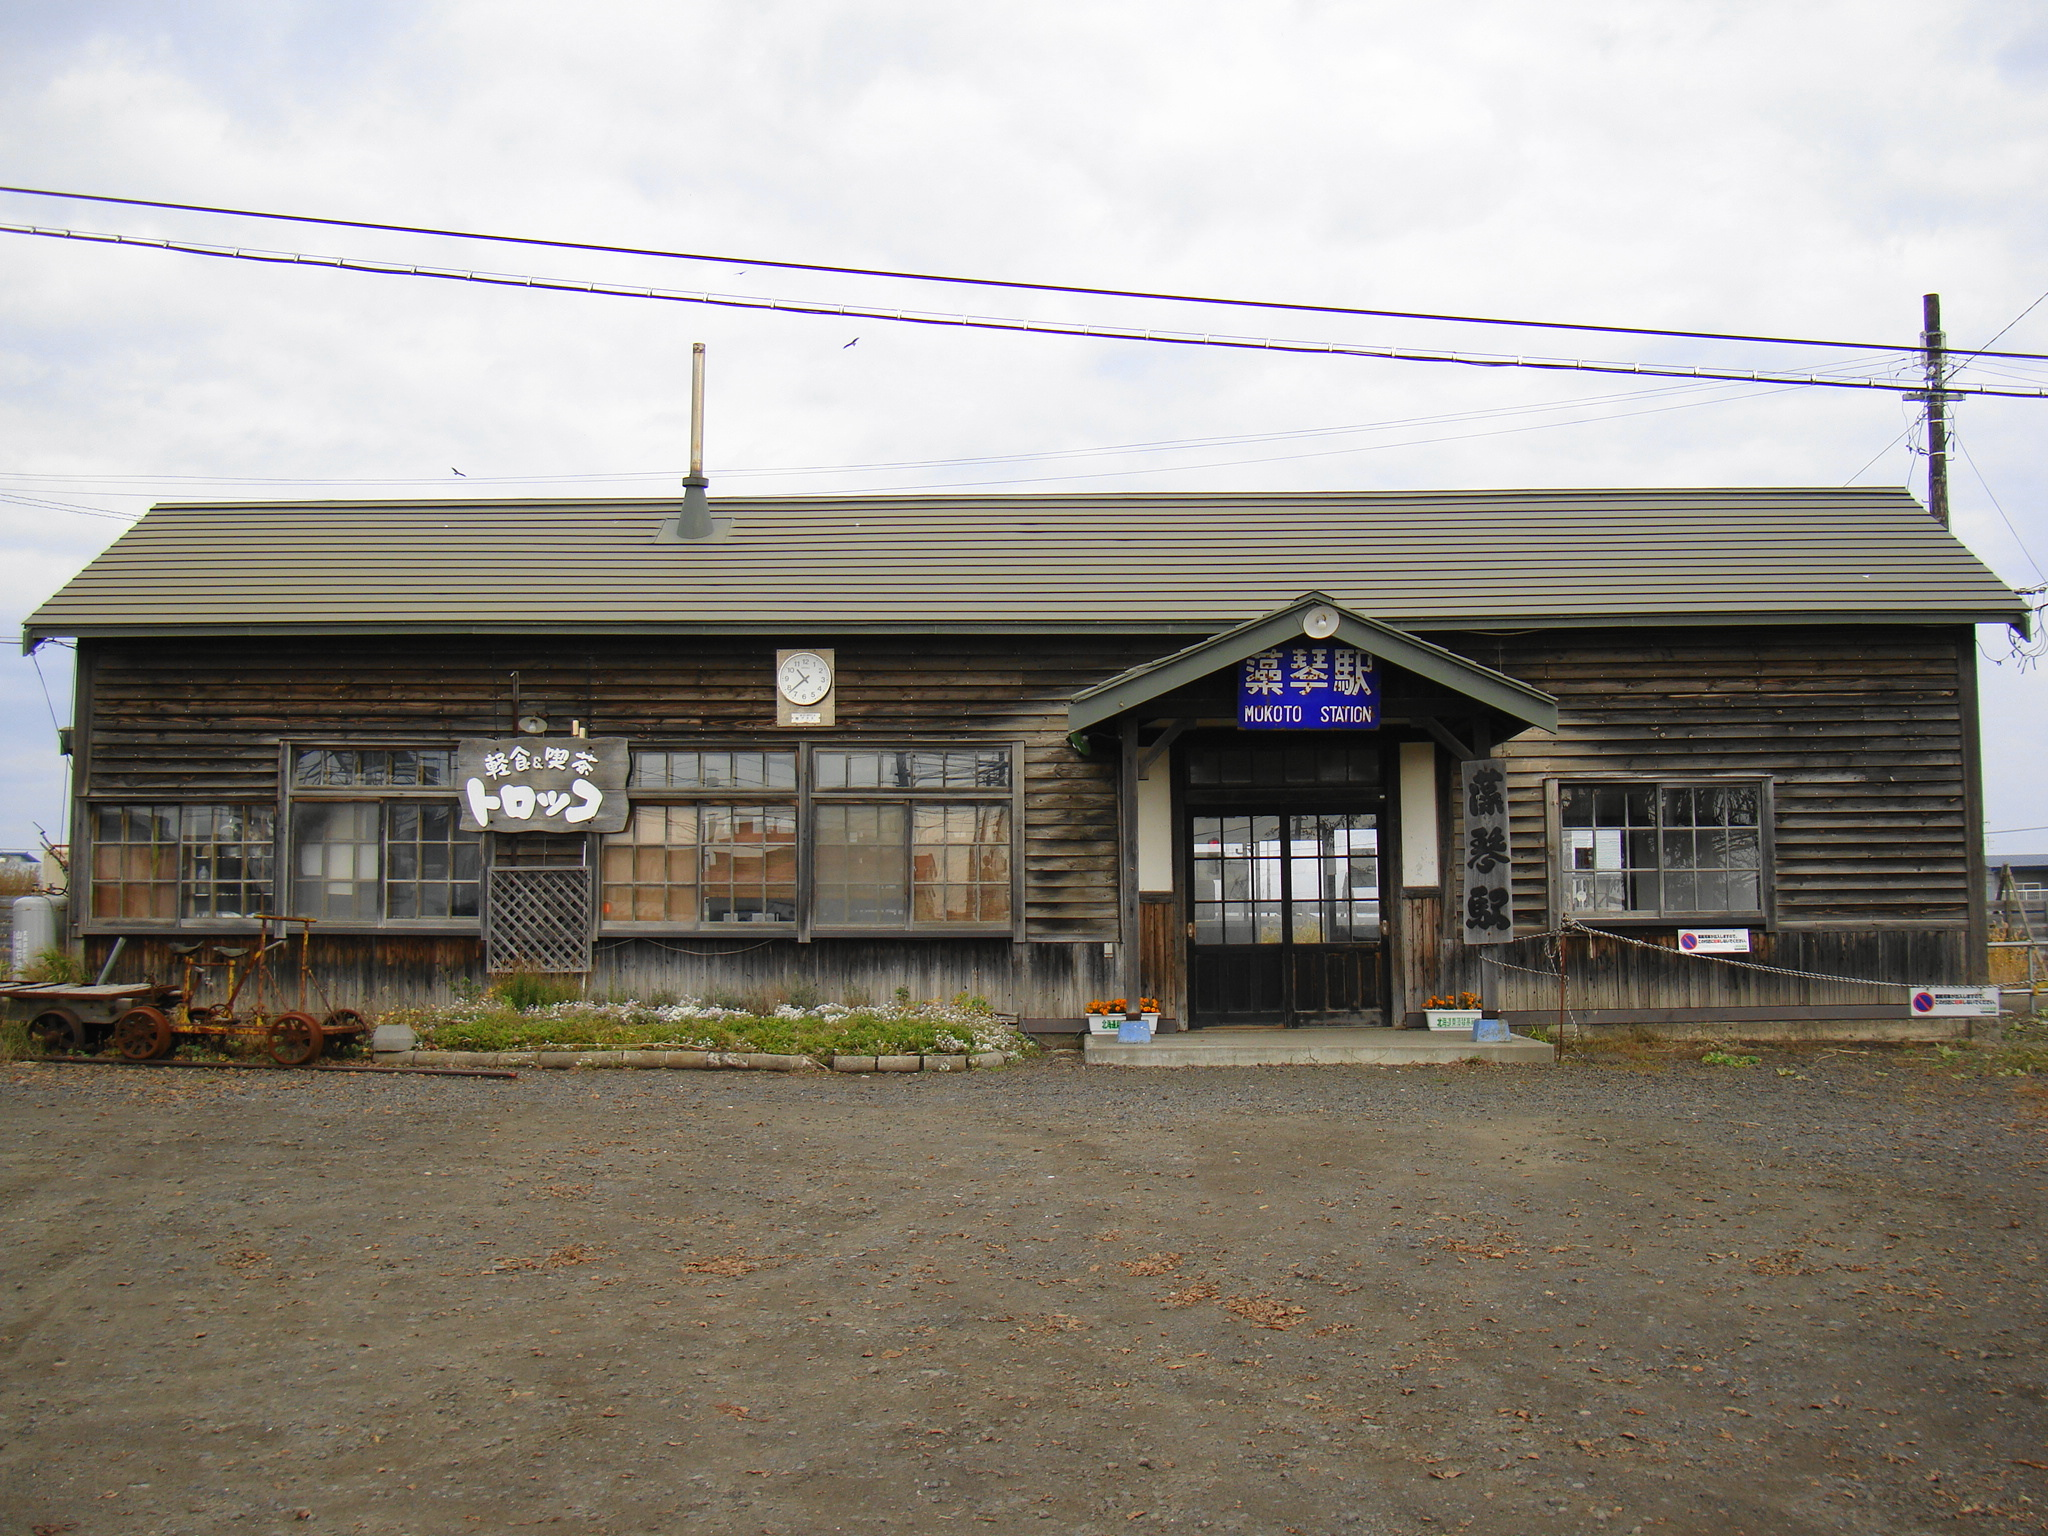 木造の鉄道駅 藻琴駅